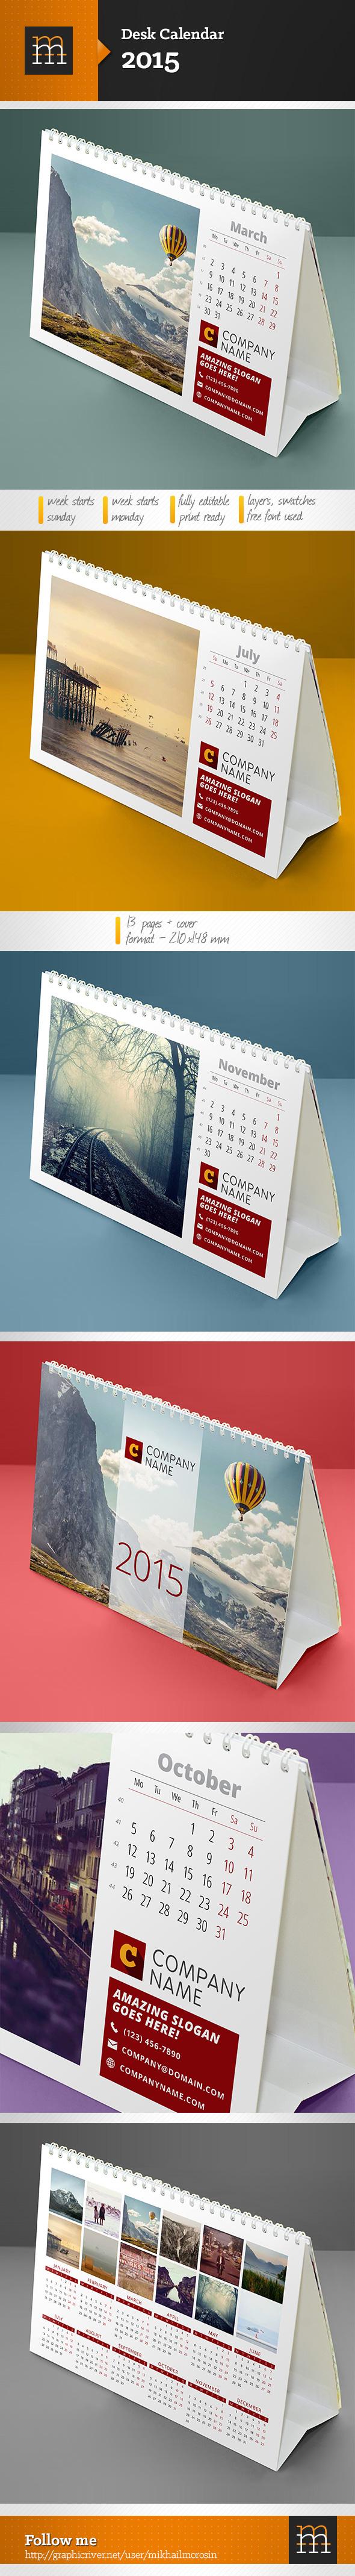 Template Kalender Meja - Kalender-Meja-2015-01-Morosin